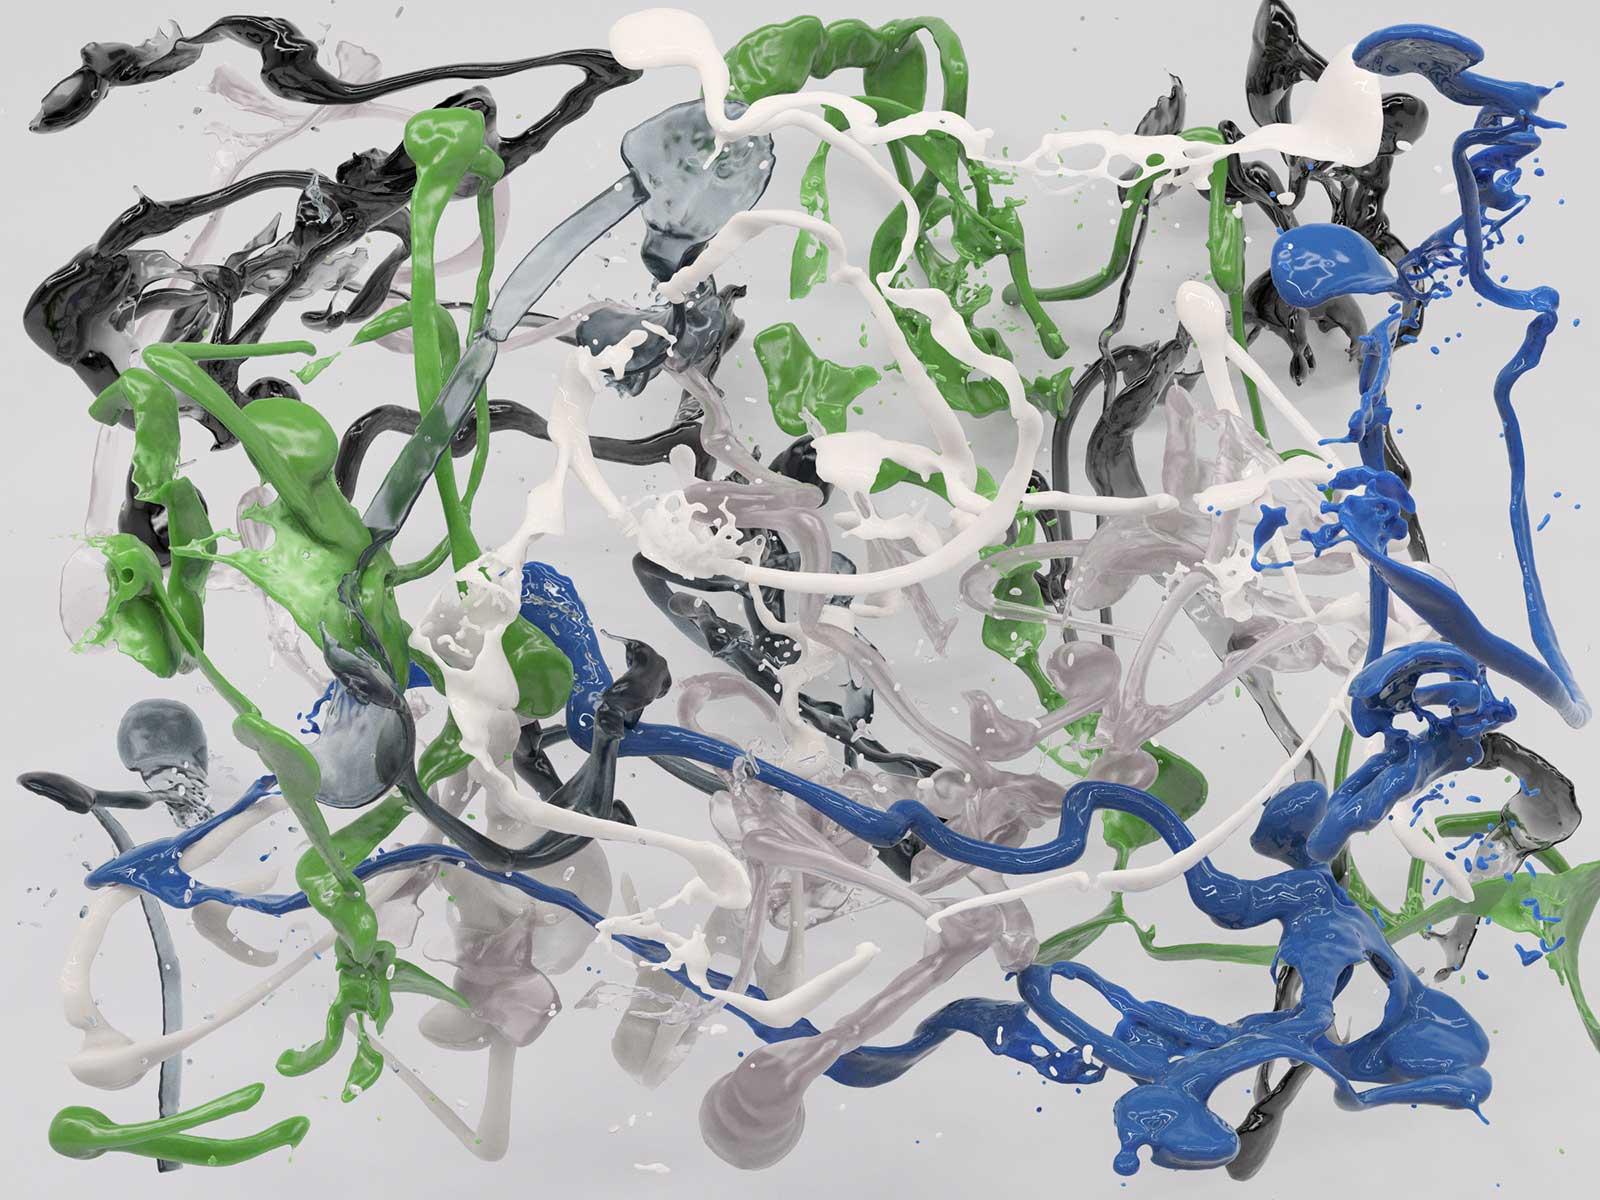 Bodypaint V 08, CGI Fine Art Print, 150 x 200 cm, 2019